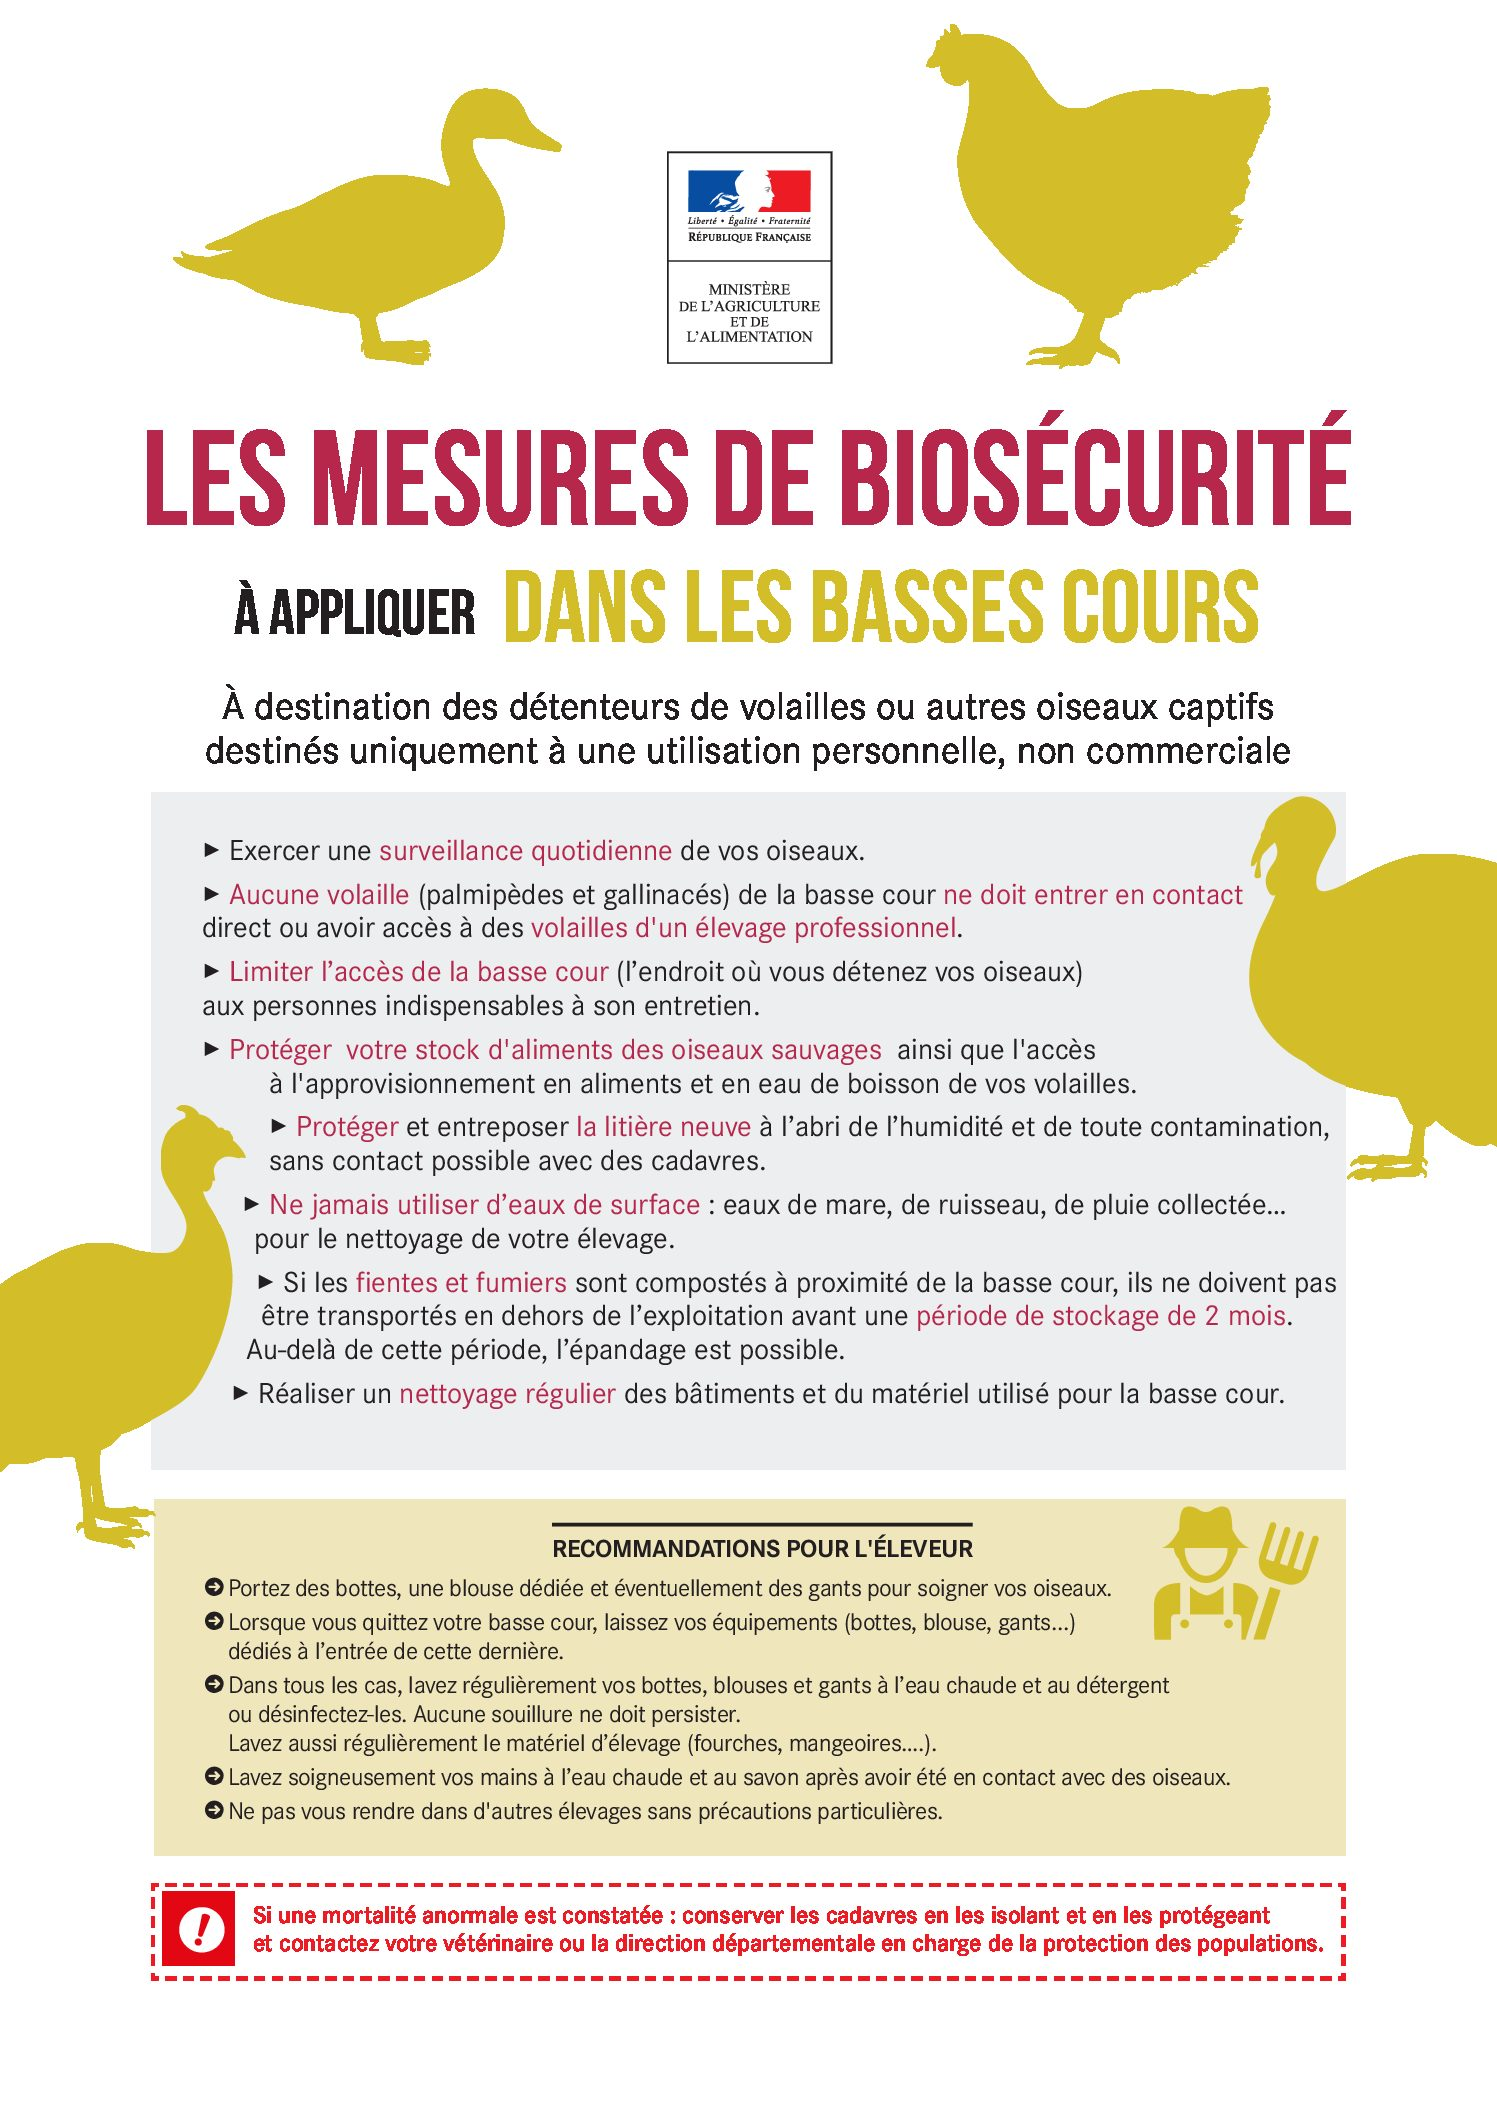 Influenza aviaire hautement pathogène